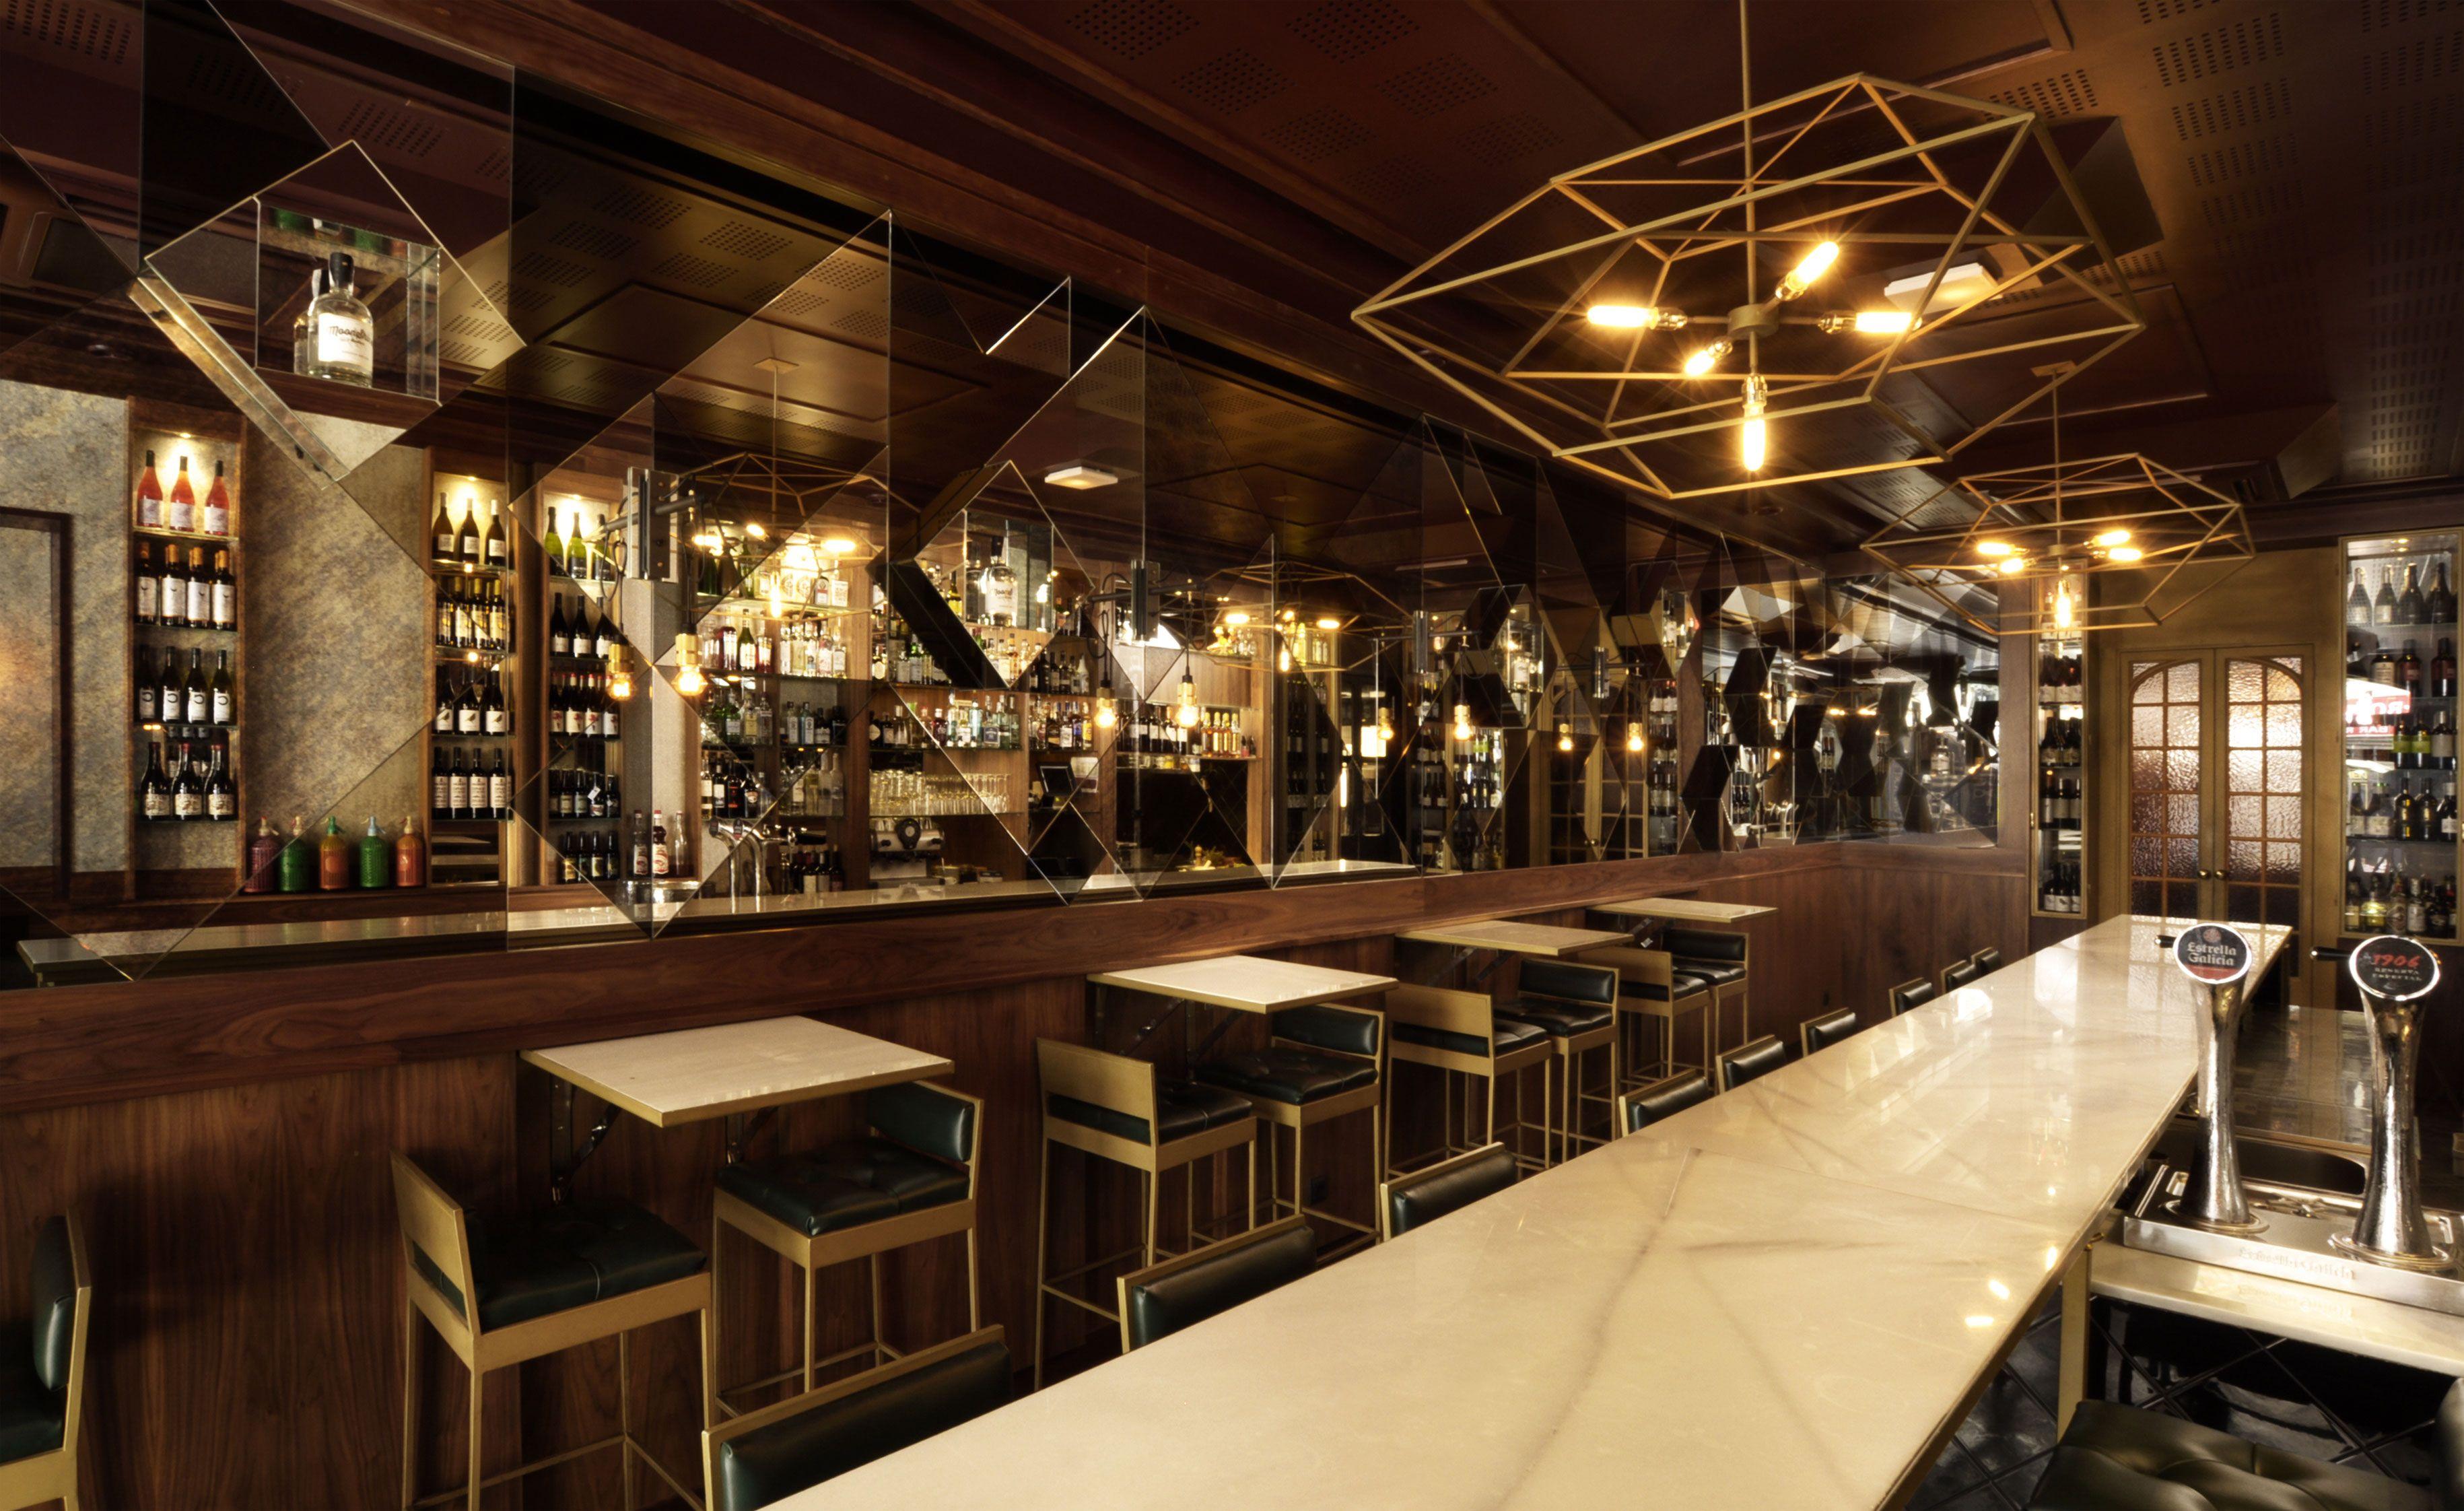 Malamen Barcelona Spain Bar Restaurant Interior Restaurant Bar Wallpaper Magazine